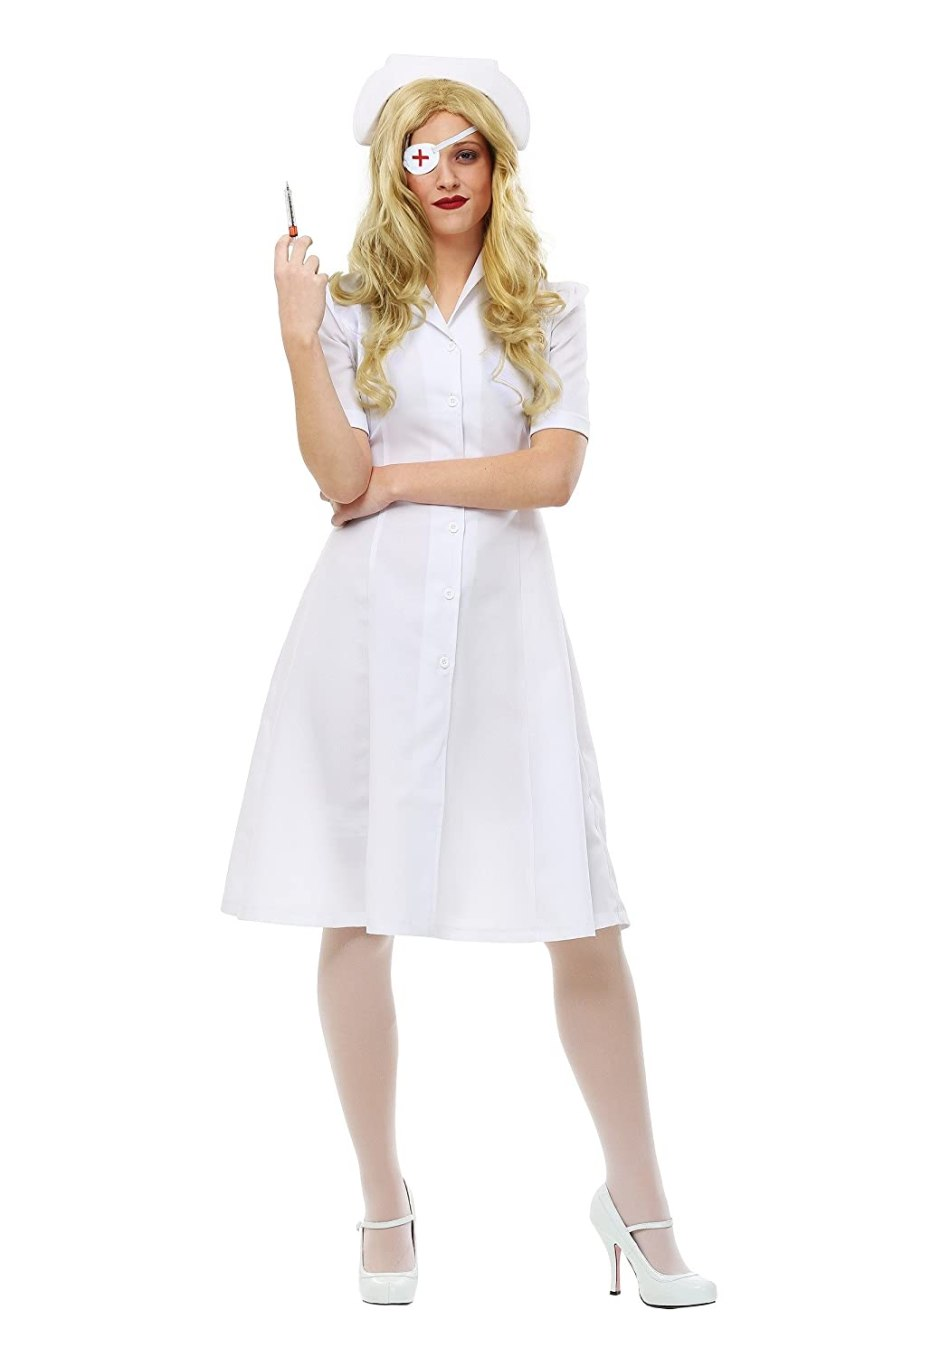 Fun Costumes womens Kill Bill Elle Driver Nurse Womens Costume